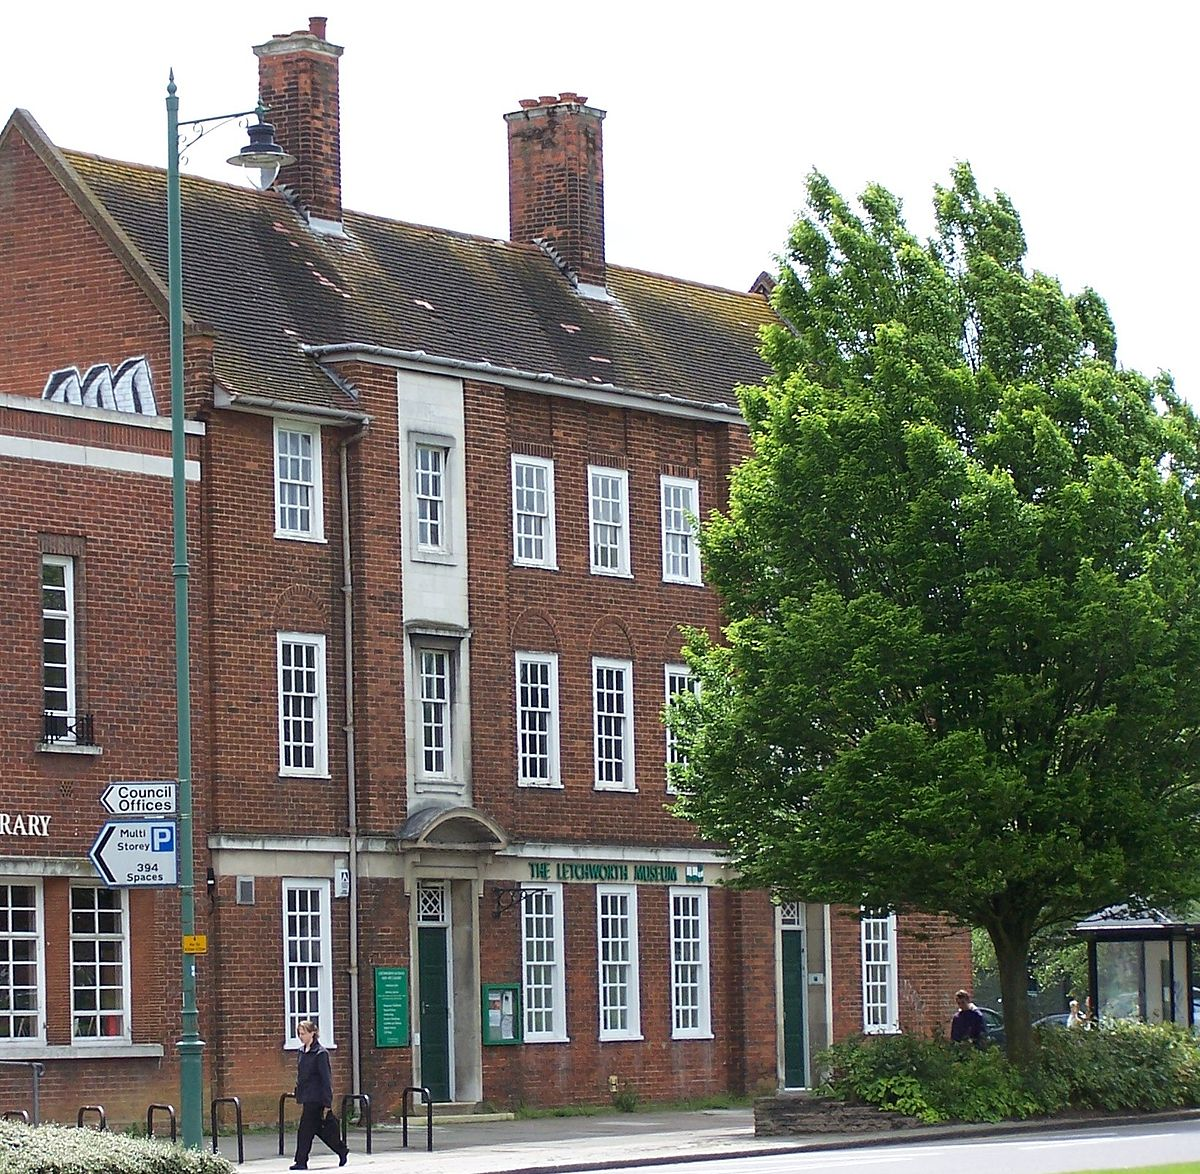 Letchworth Museum & Art Gallery